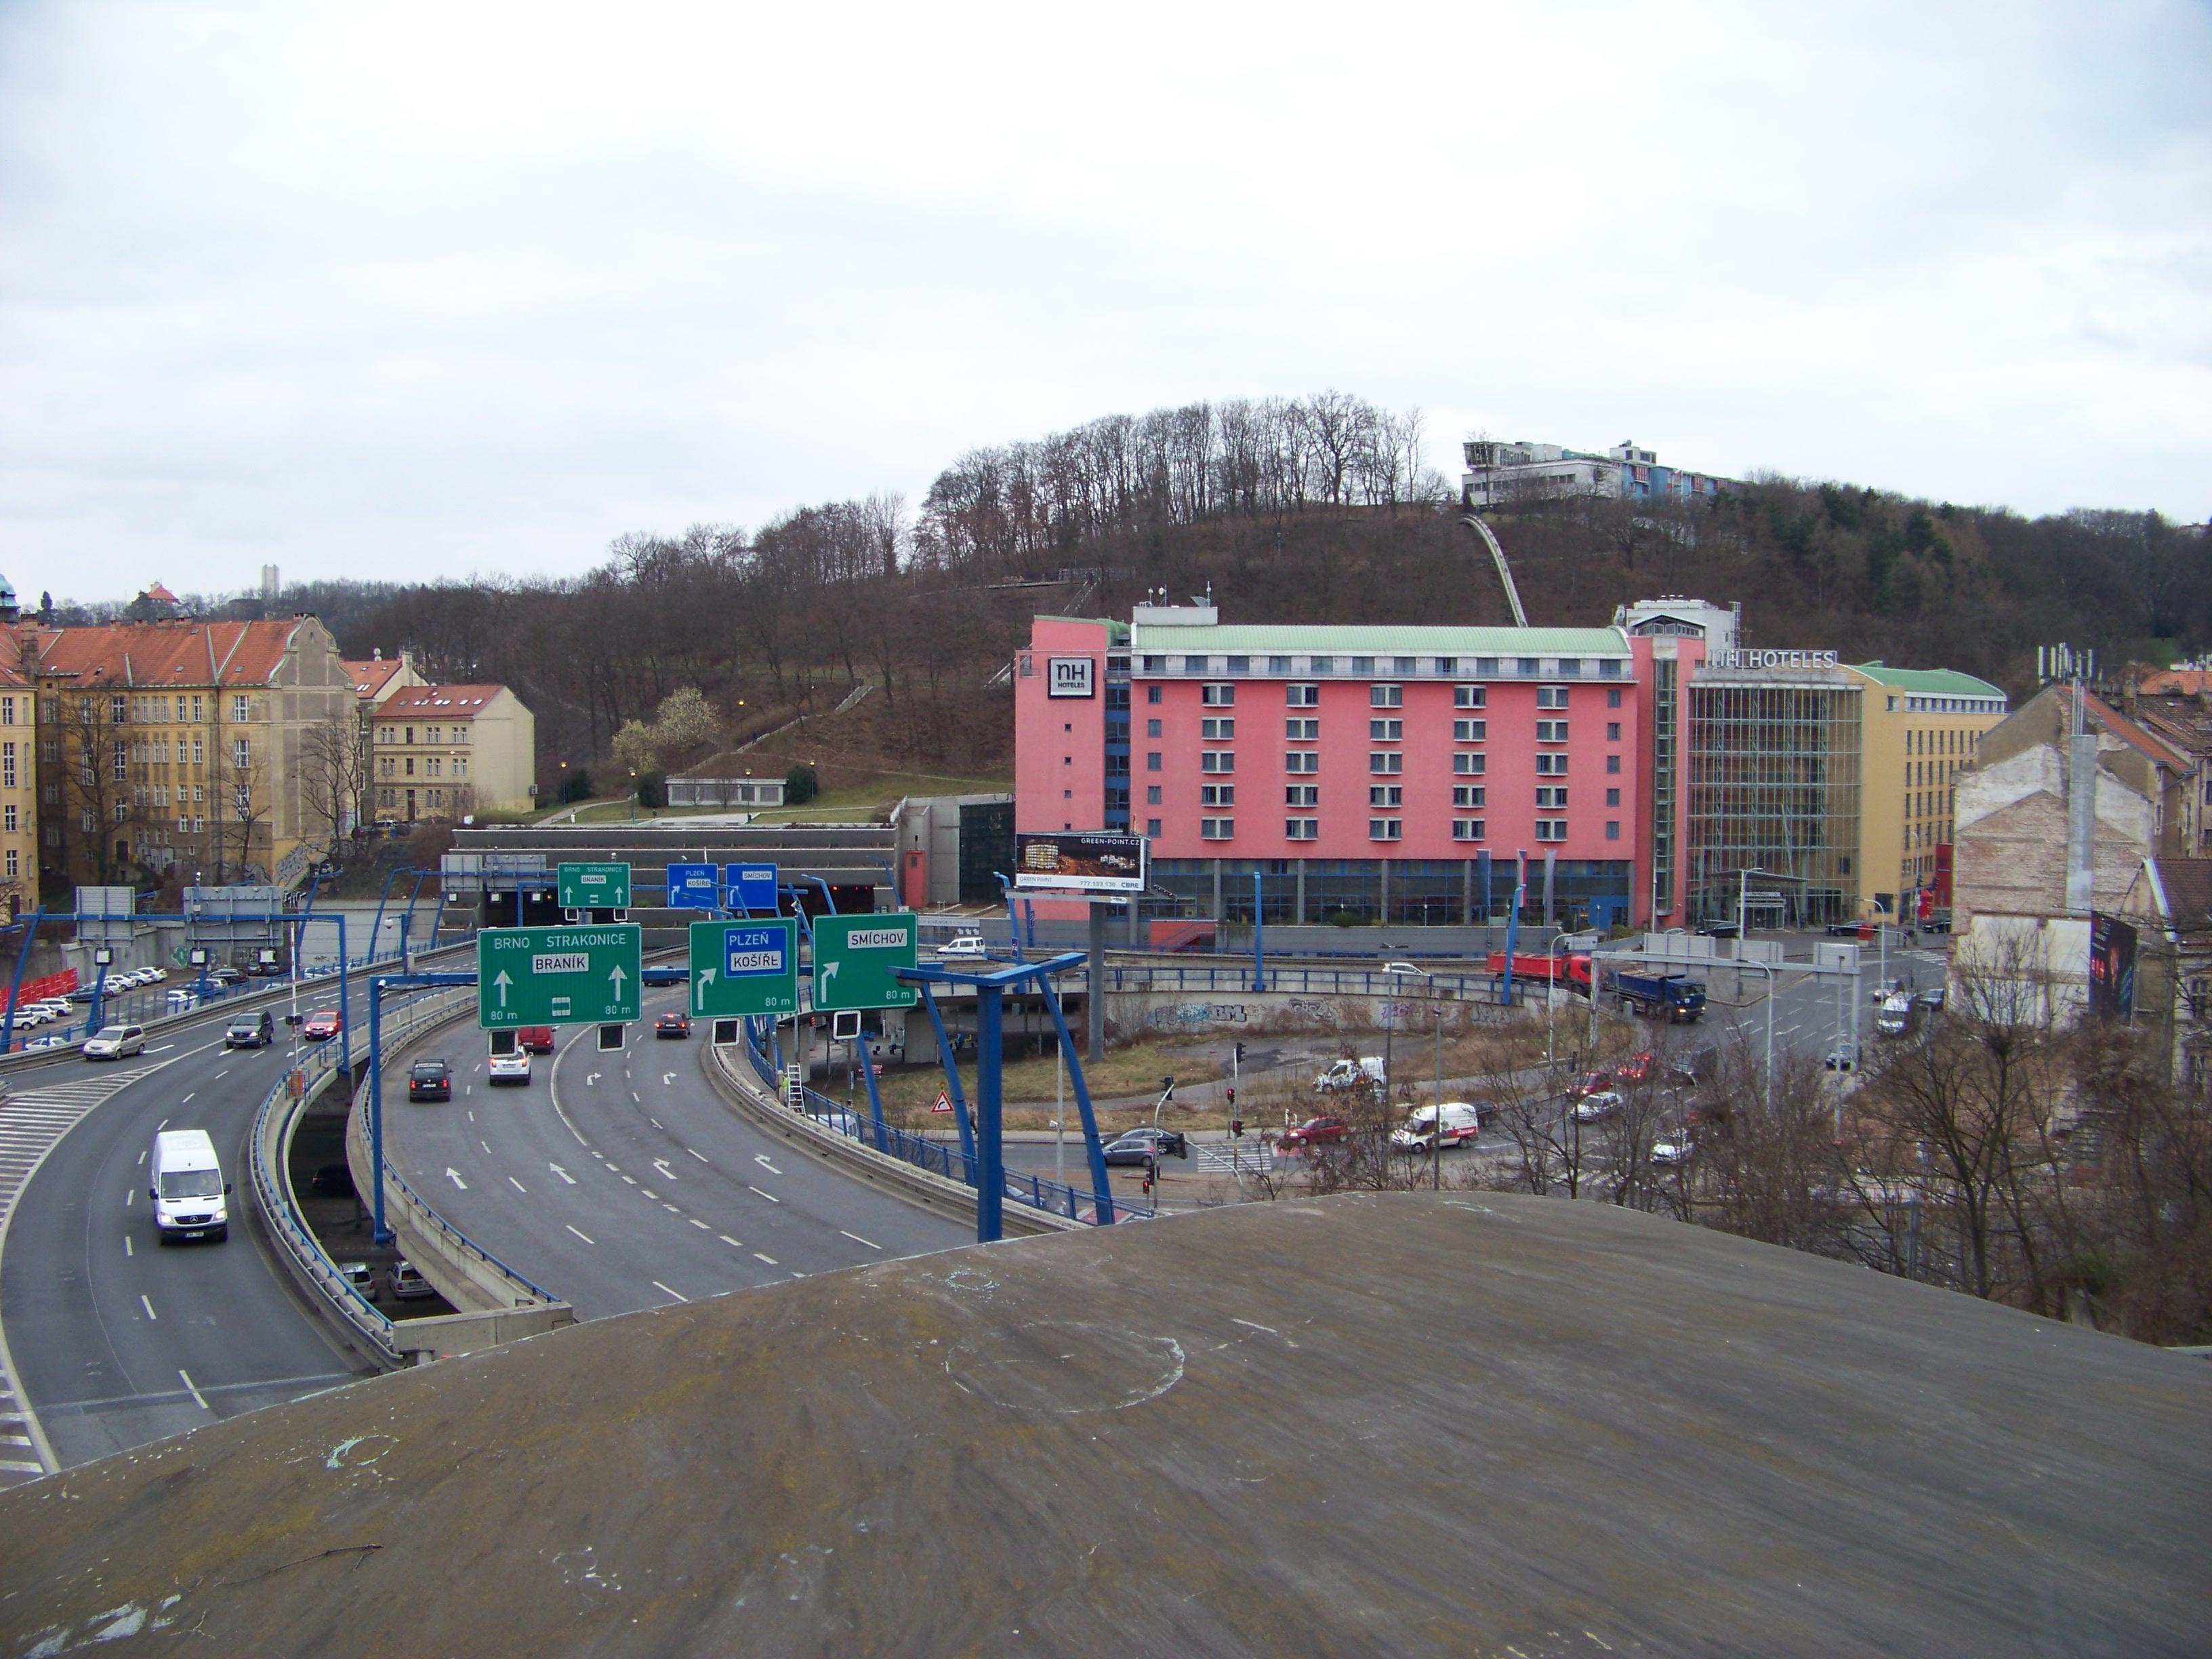 Nh Hotel City Center Dubeldorf